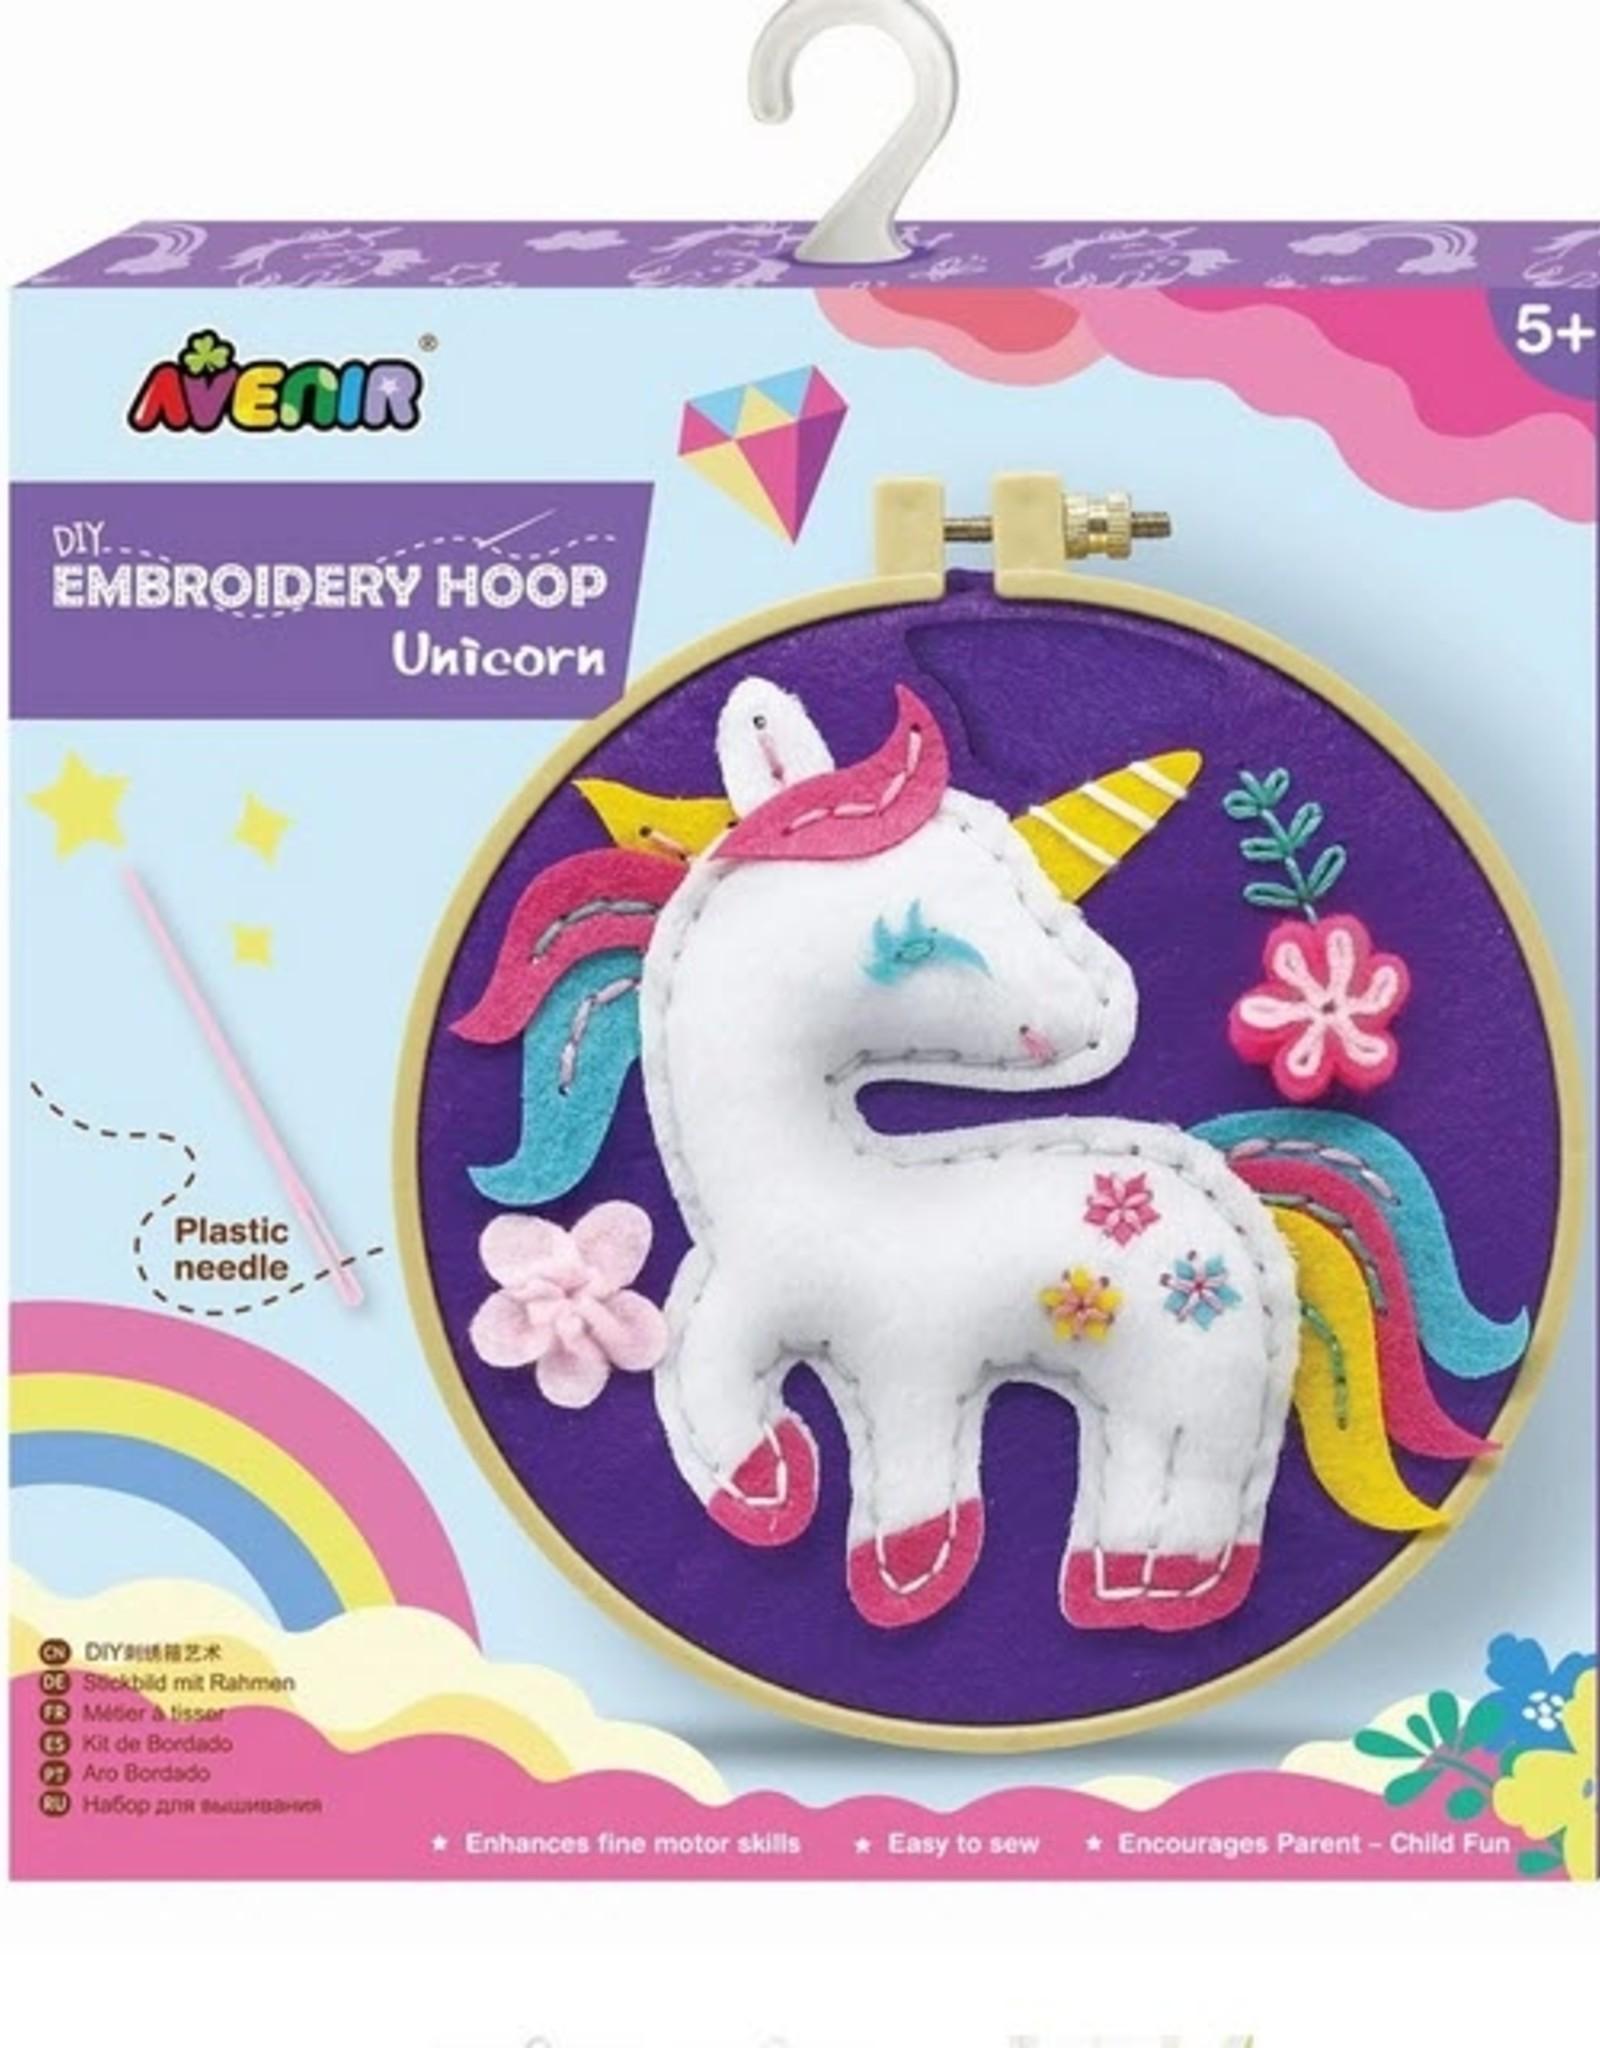 Avenir - Embroidery Hoop Unicorn